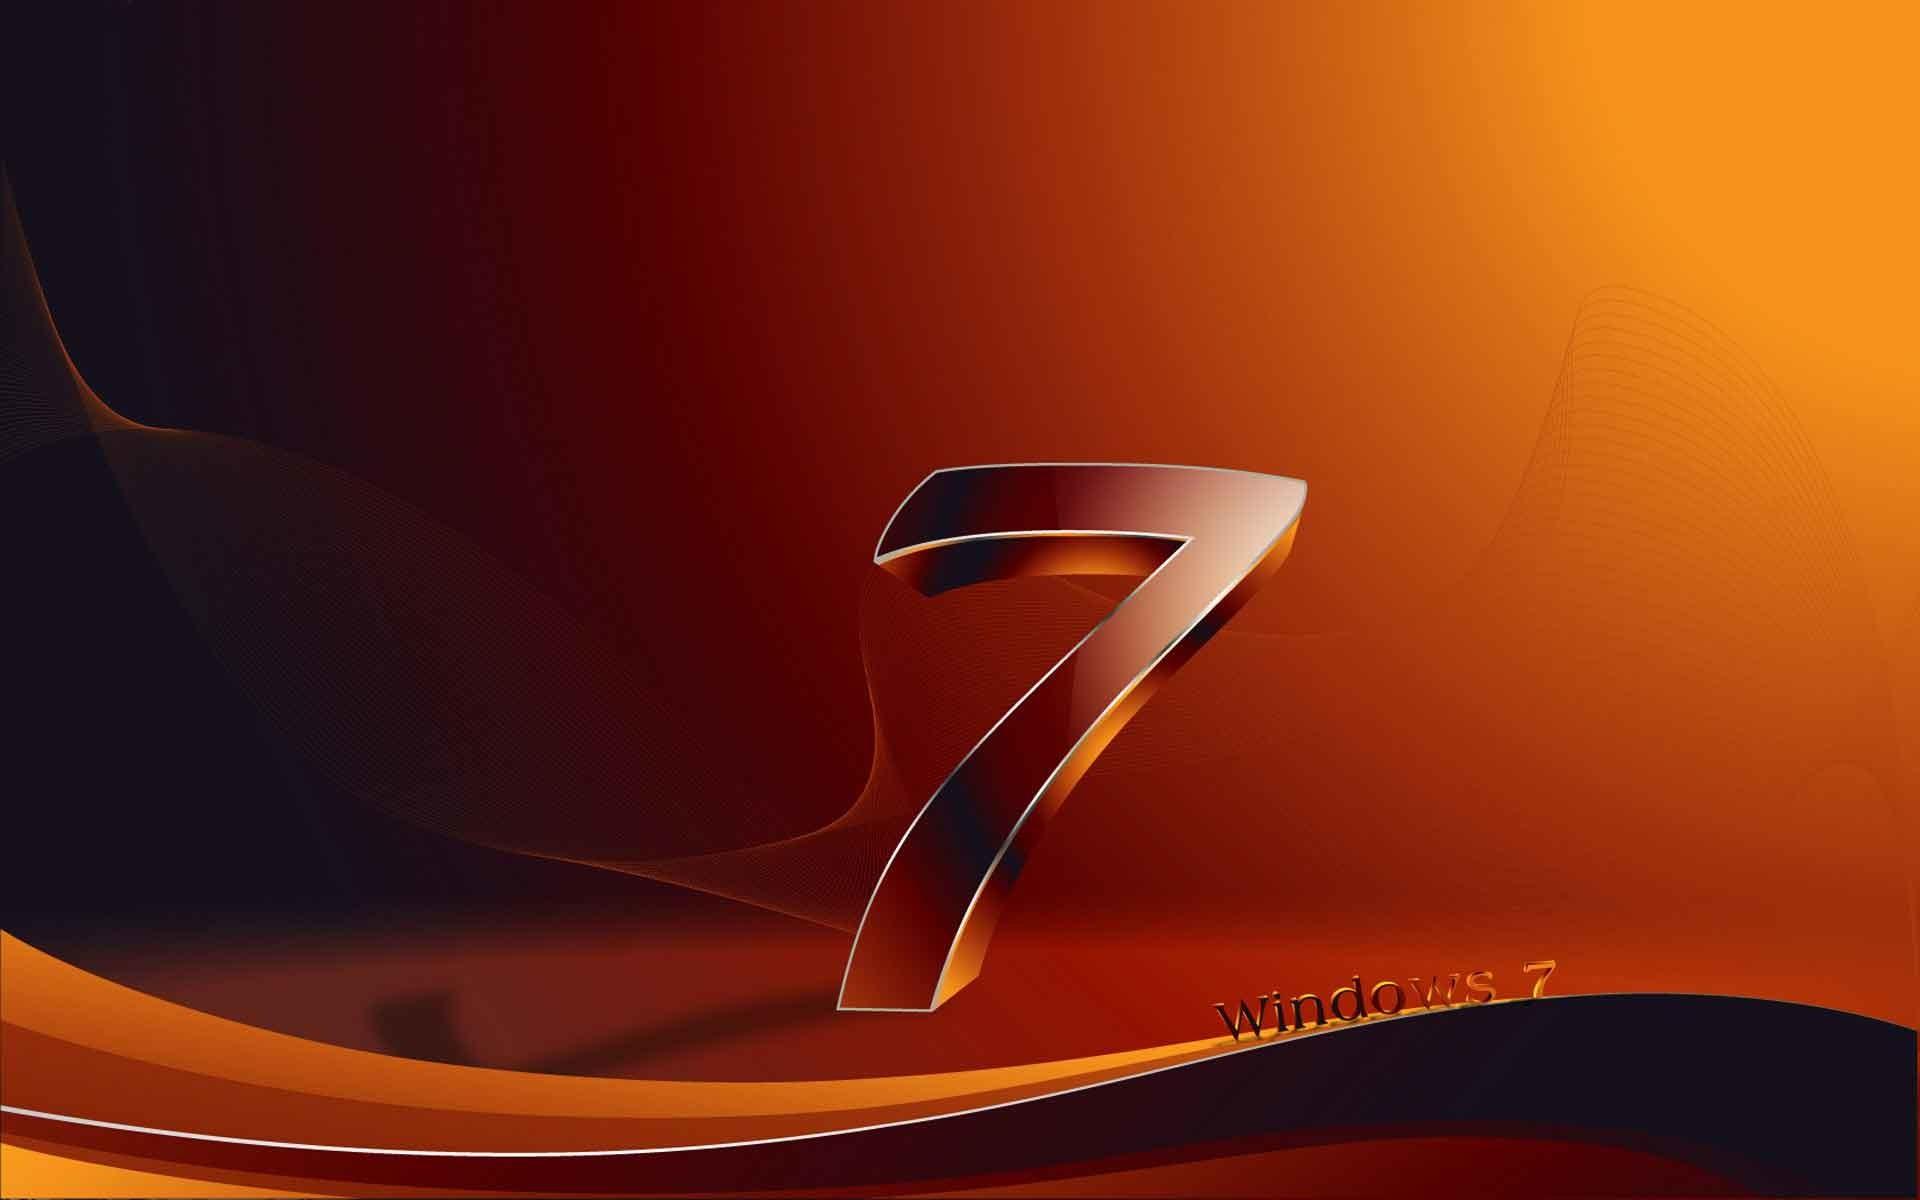 Windows-7-Red-Desktop-Wallpaper-HD-free